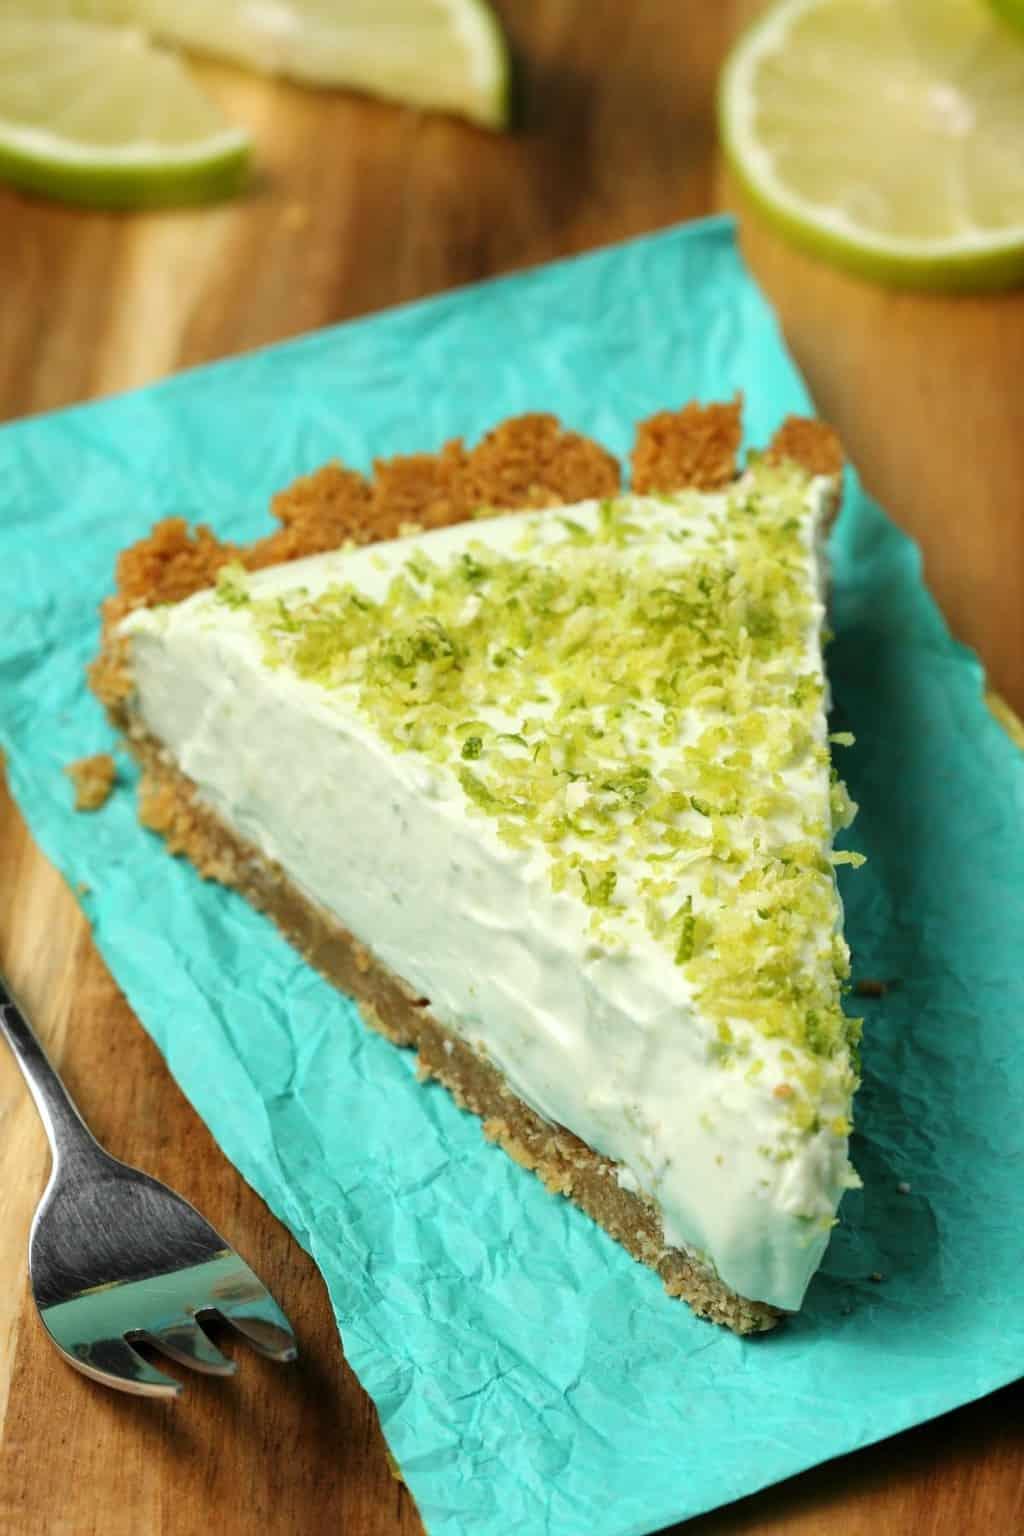 A slice of vegan key lime pie on a blue napkin.